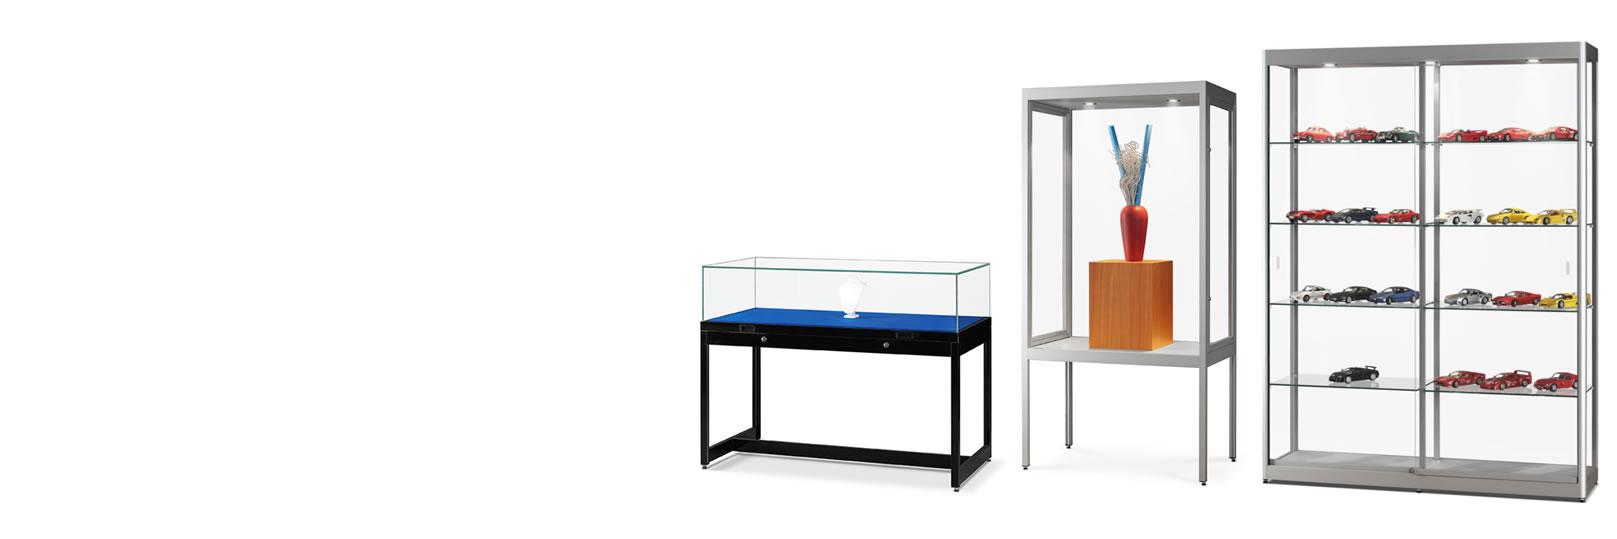 Prosklené vitríny na produkty a exponáty